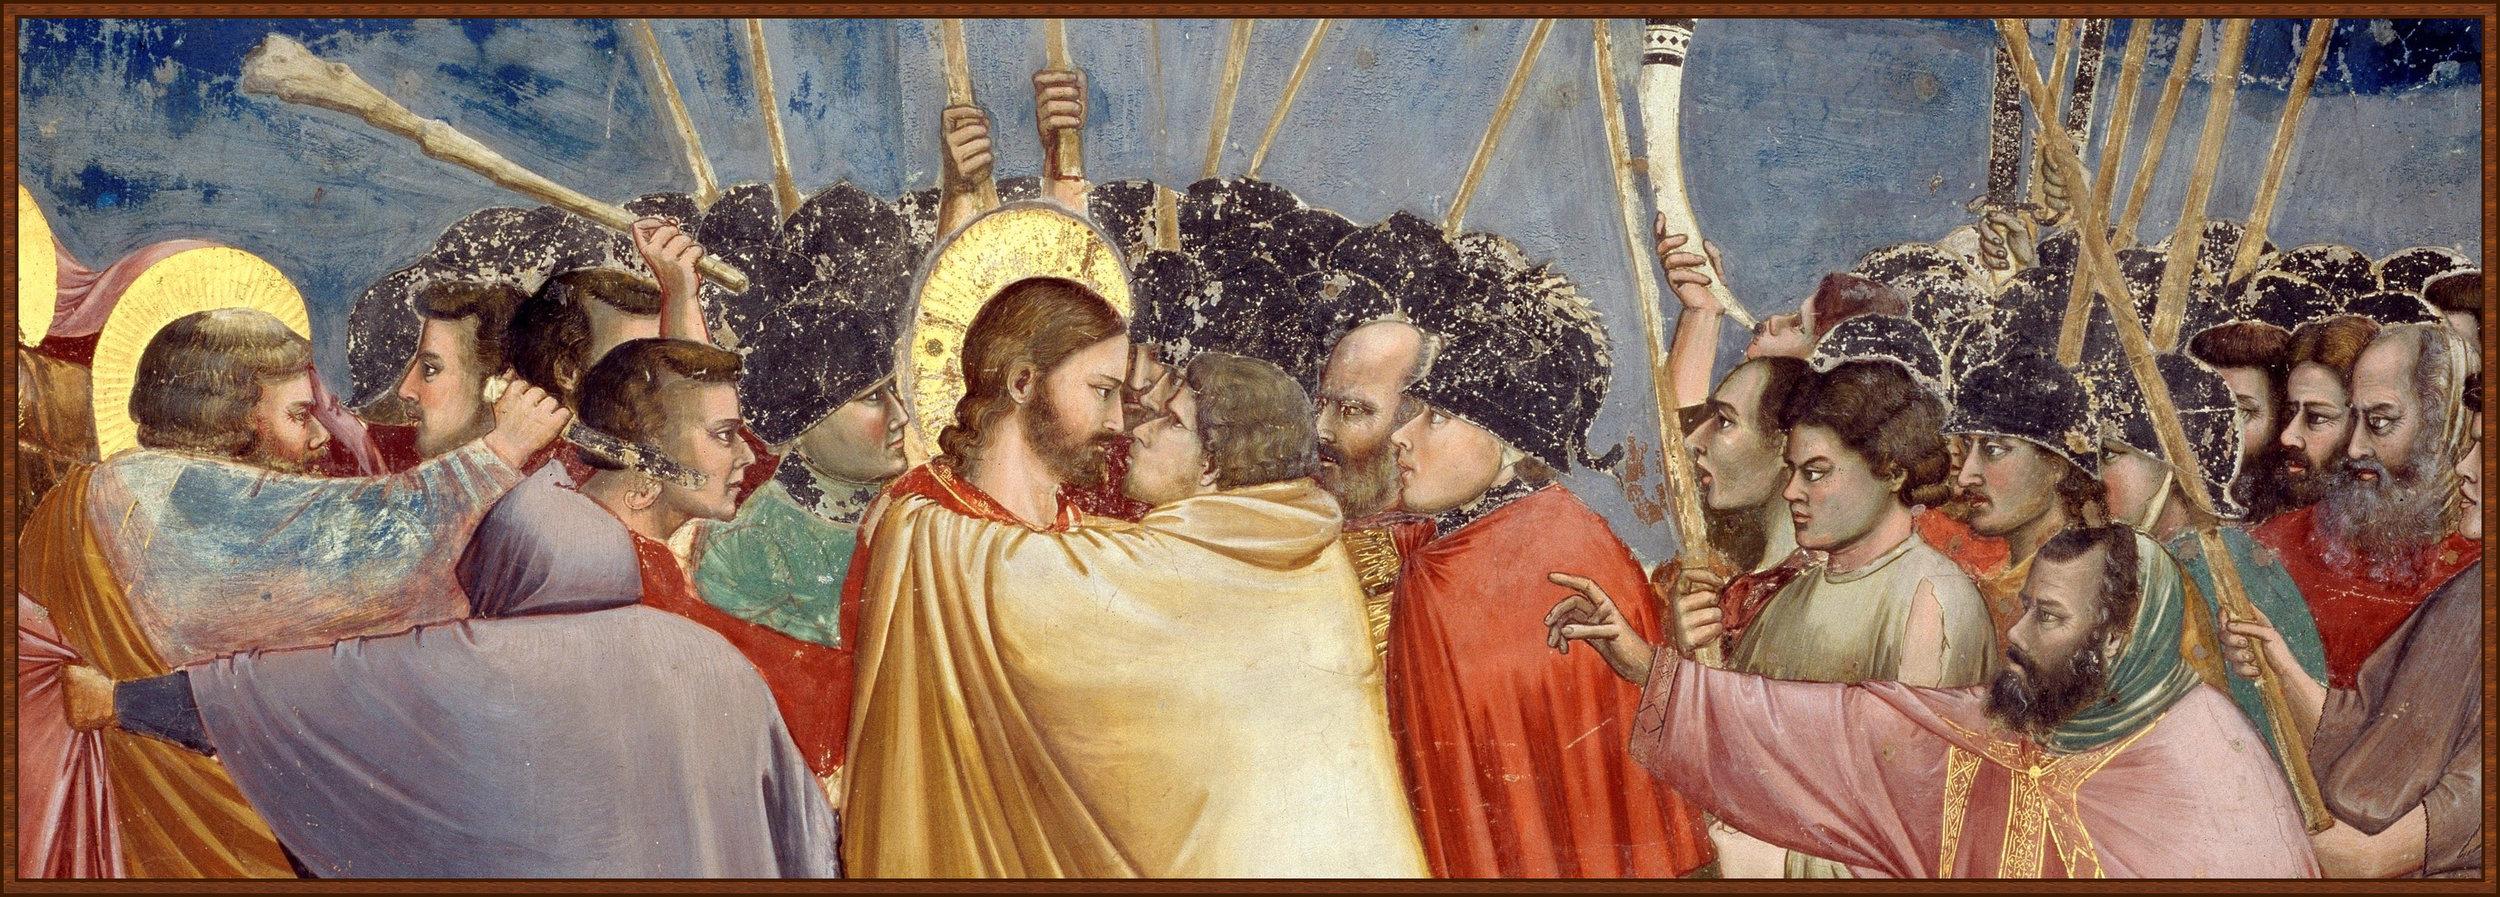 GiottoKissOfJudasFramed.jpg